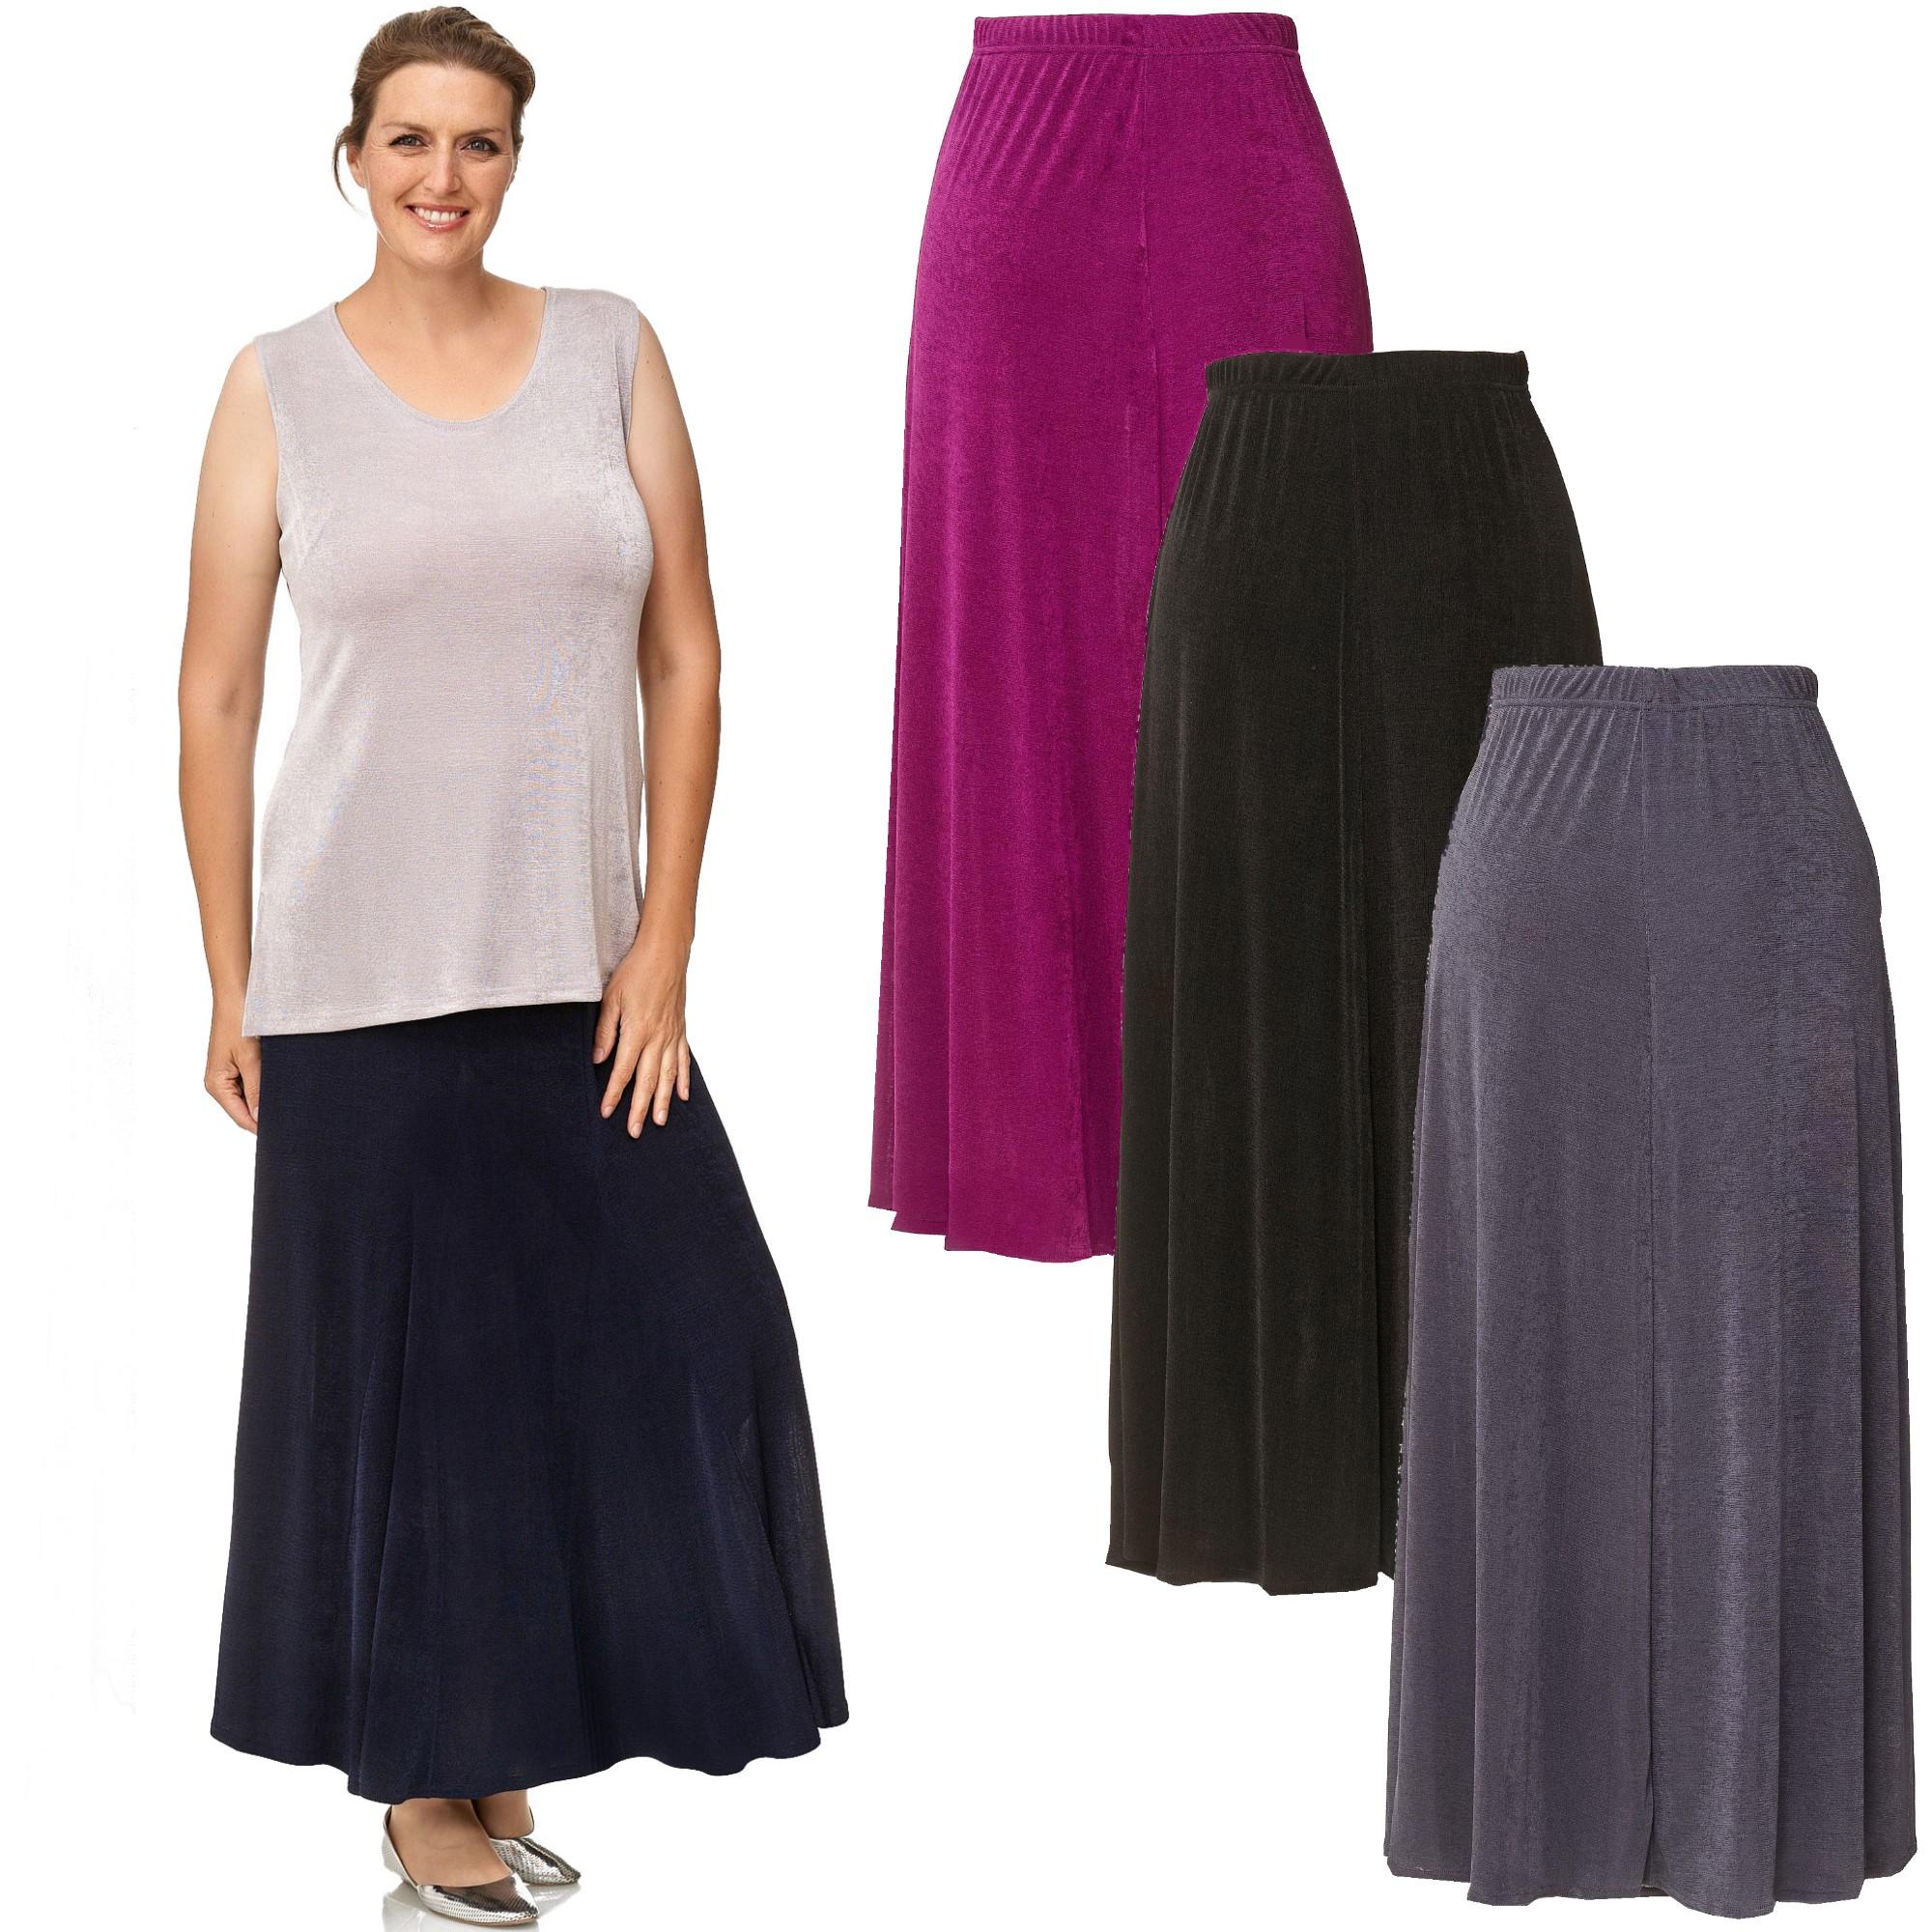 fbe25e6aebc4 Details zu Damen Rock SLINKY Godetfalten Maxi Faltenrock Skirt - Lagenlook  Rundum Dehnbund